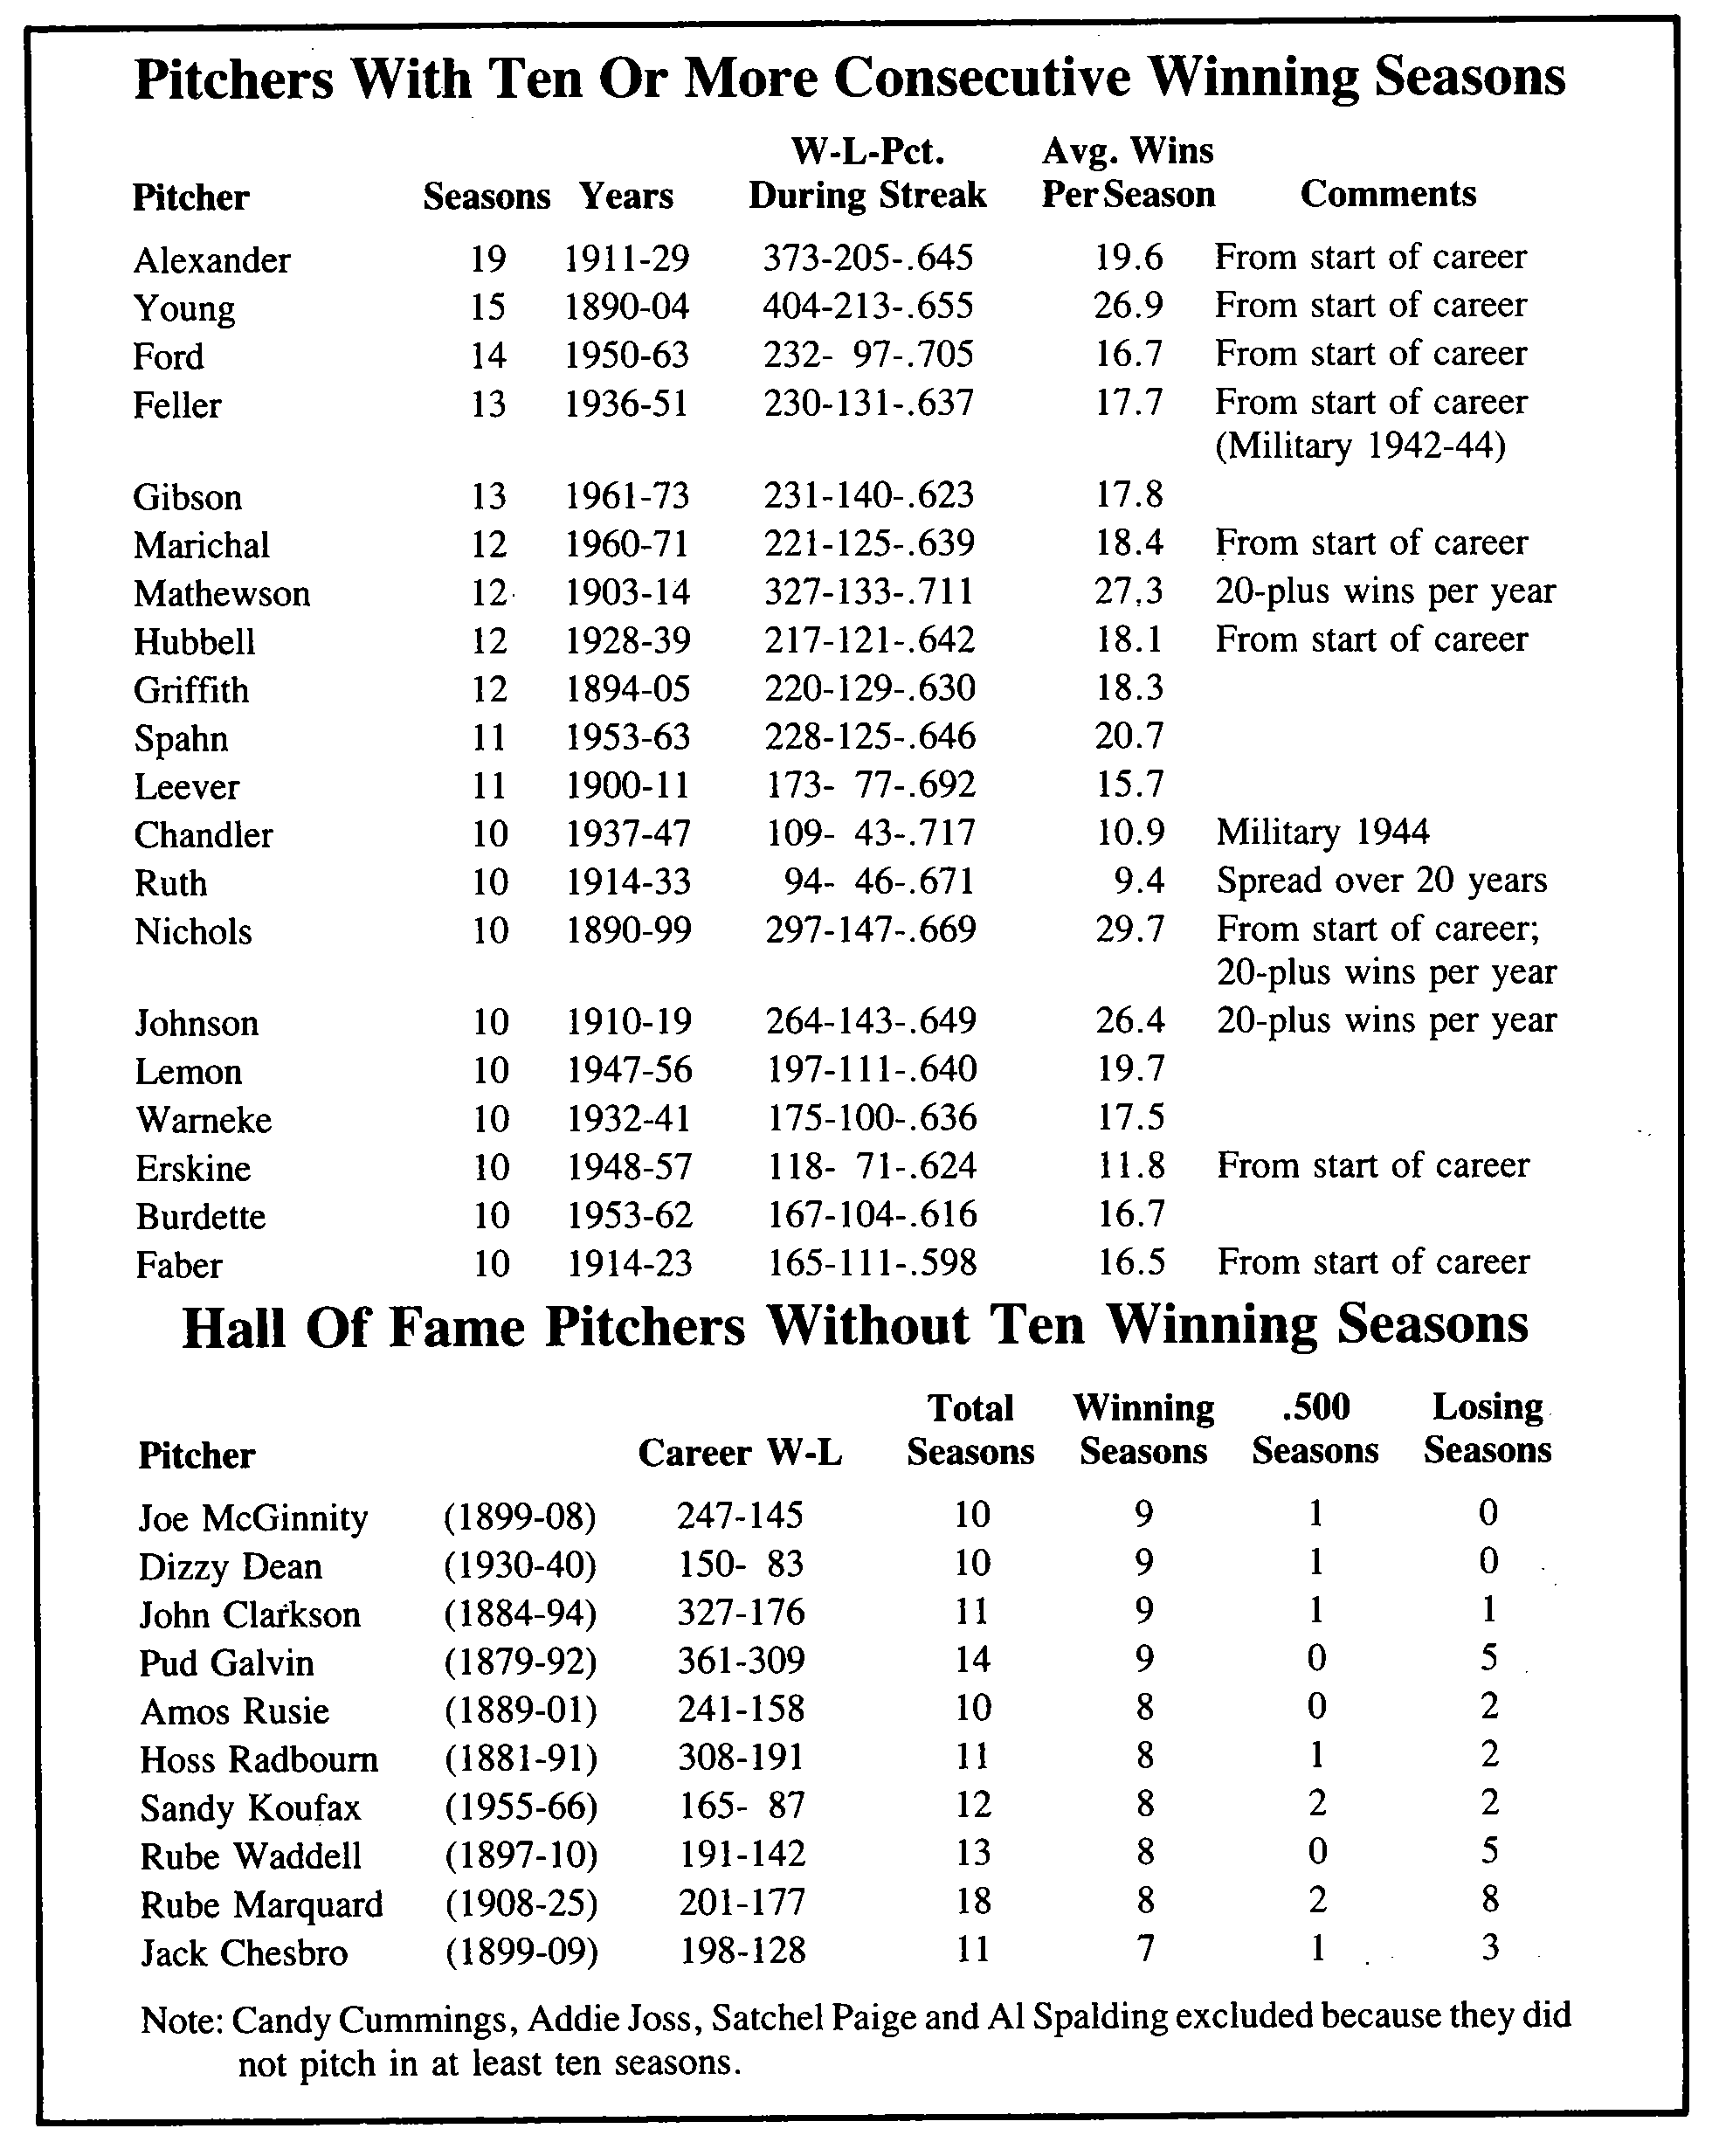 Jim Polhamus: Table 3